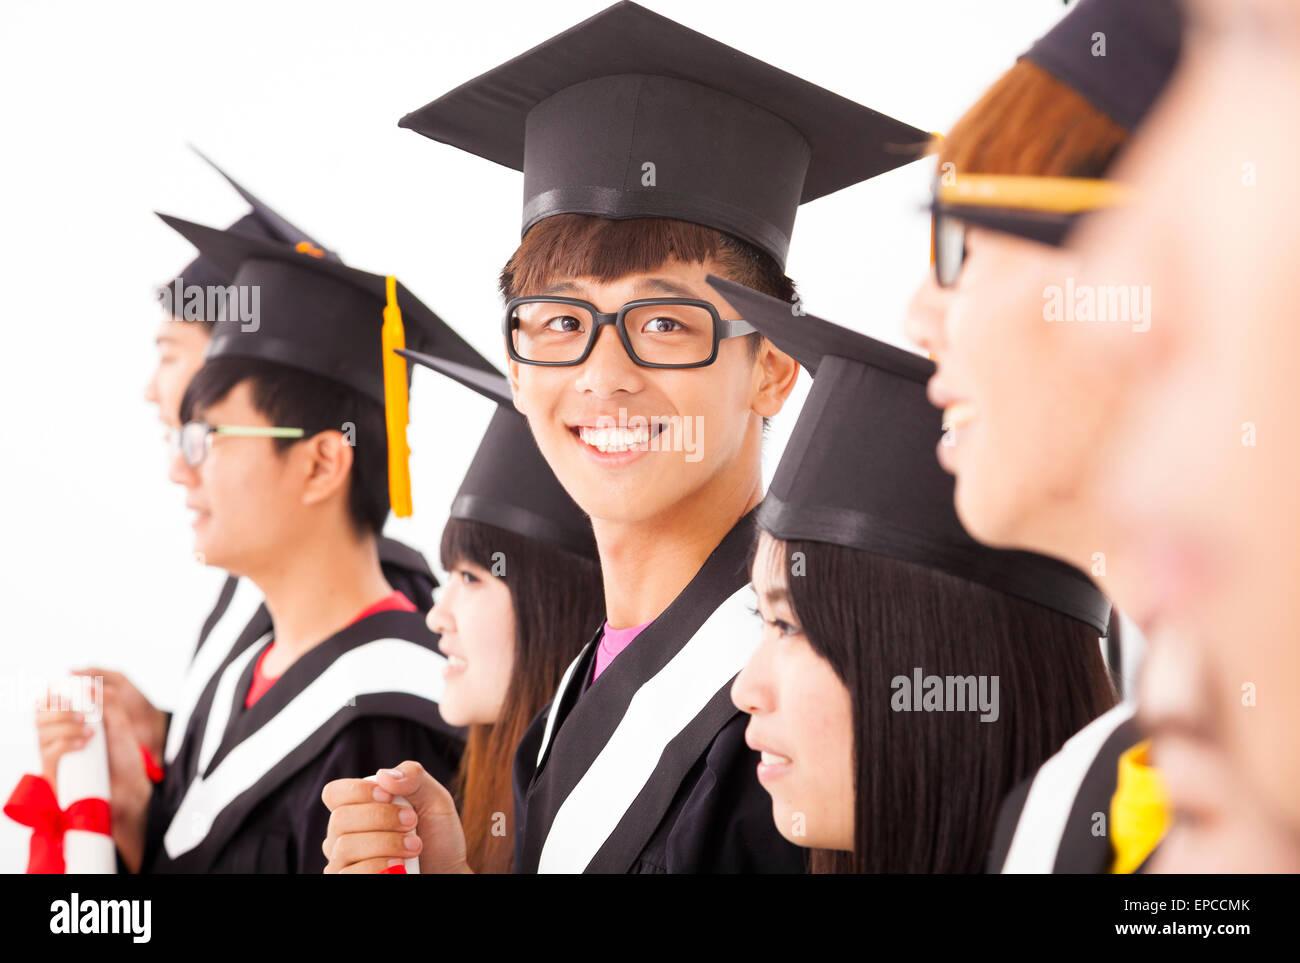 85e6941a06d asian male college graduate at graduation with classmates - Stock Image